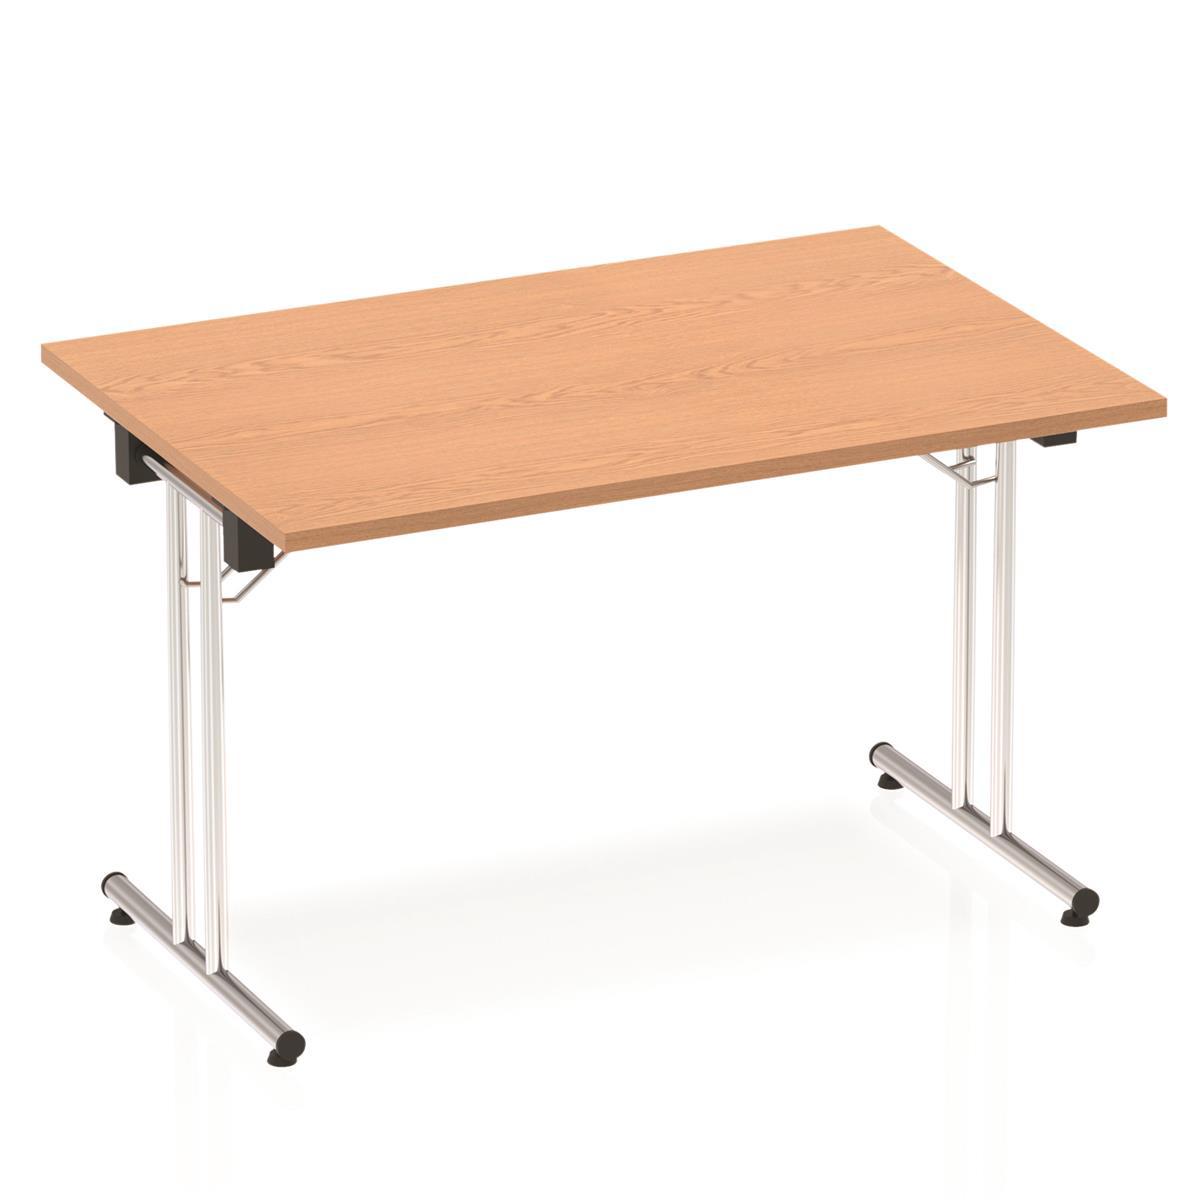 Sonix Rectangular Chrome Leg Folding Meeting Table 1200x800mm Oak Ref I000796